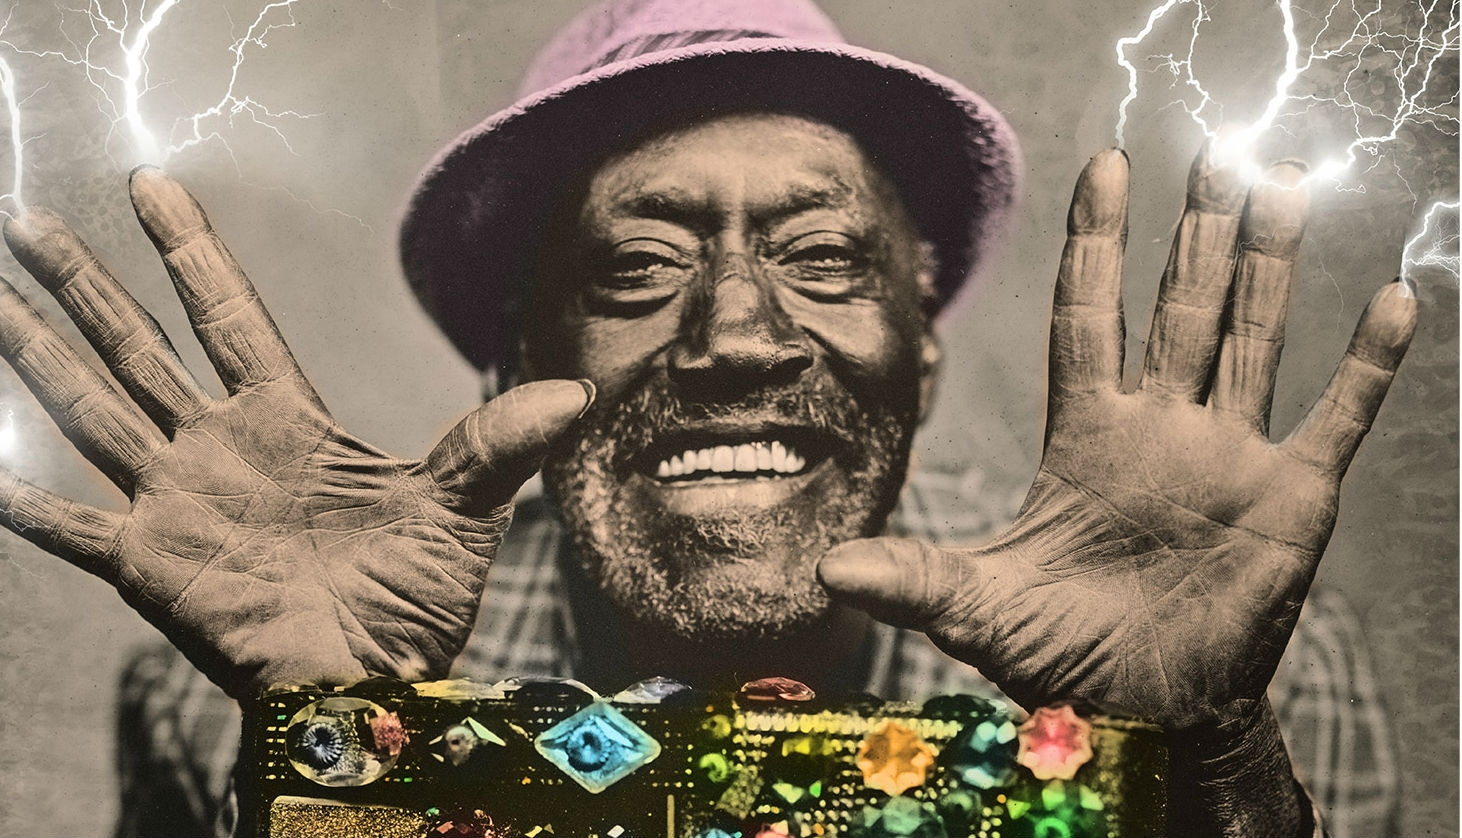 Meet obscure R&B legend Ironing Board Sam